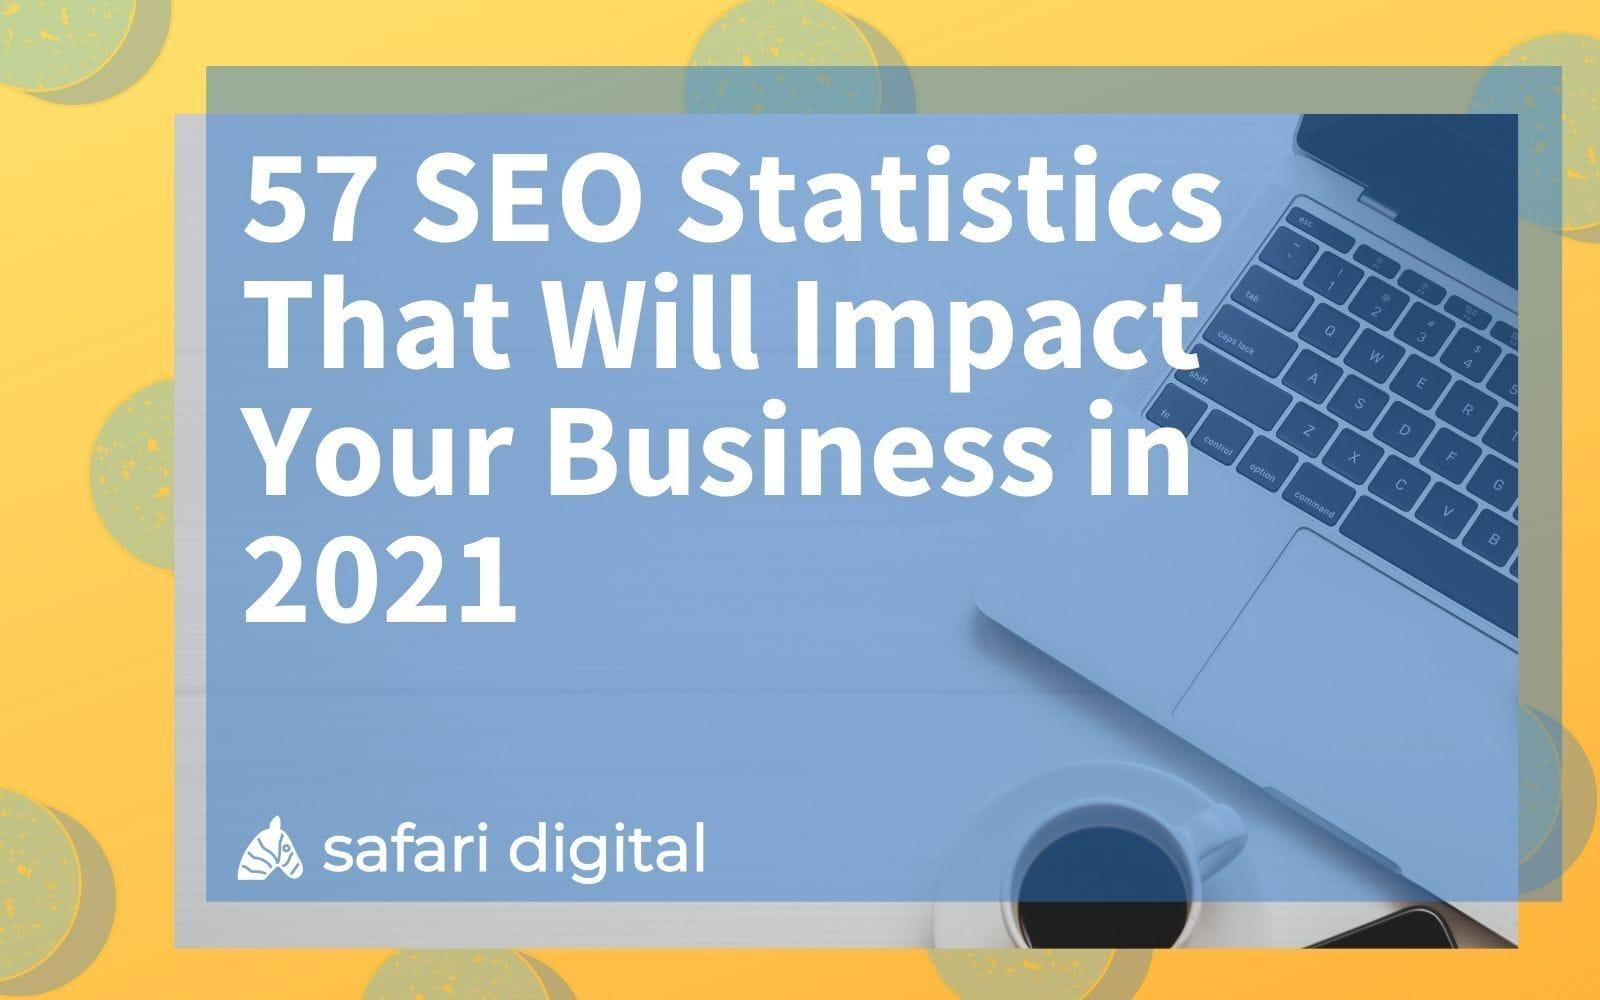 57 SEO statistics 2021 cover image